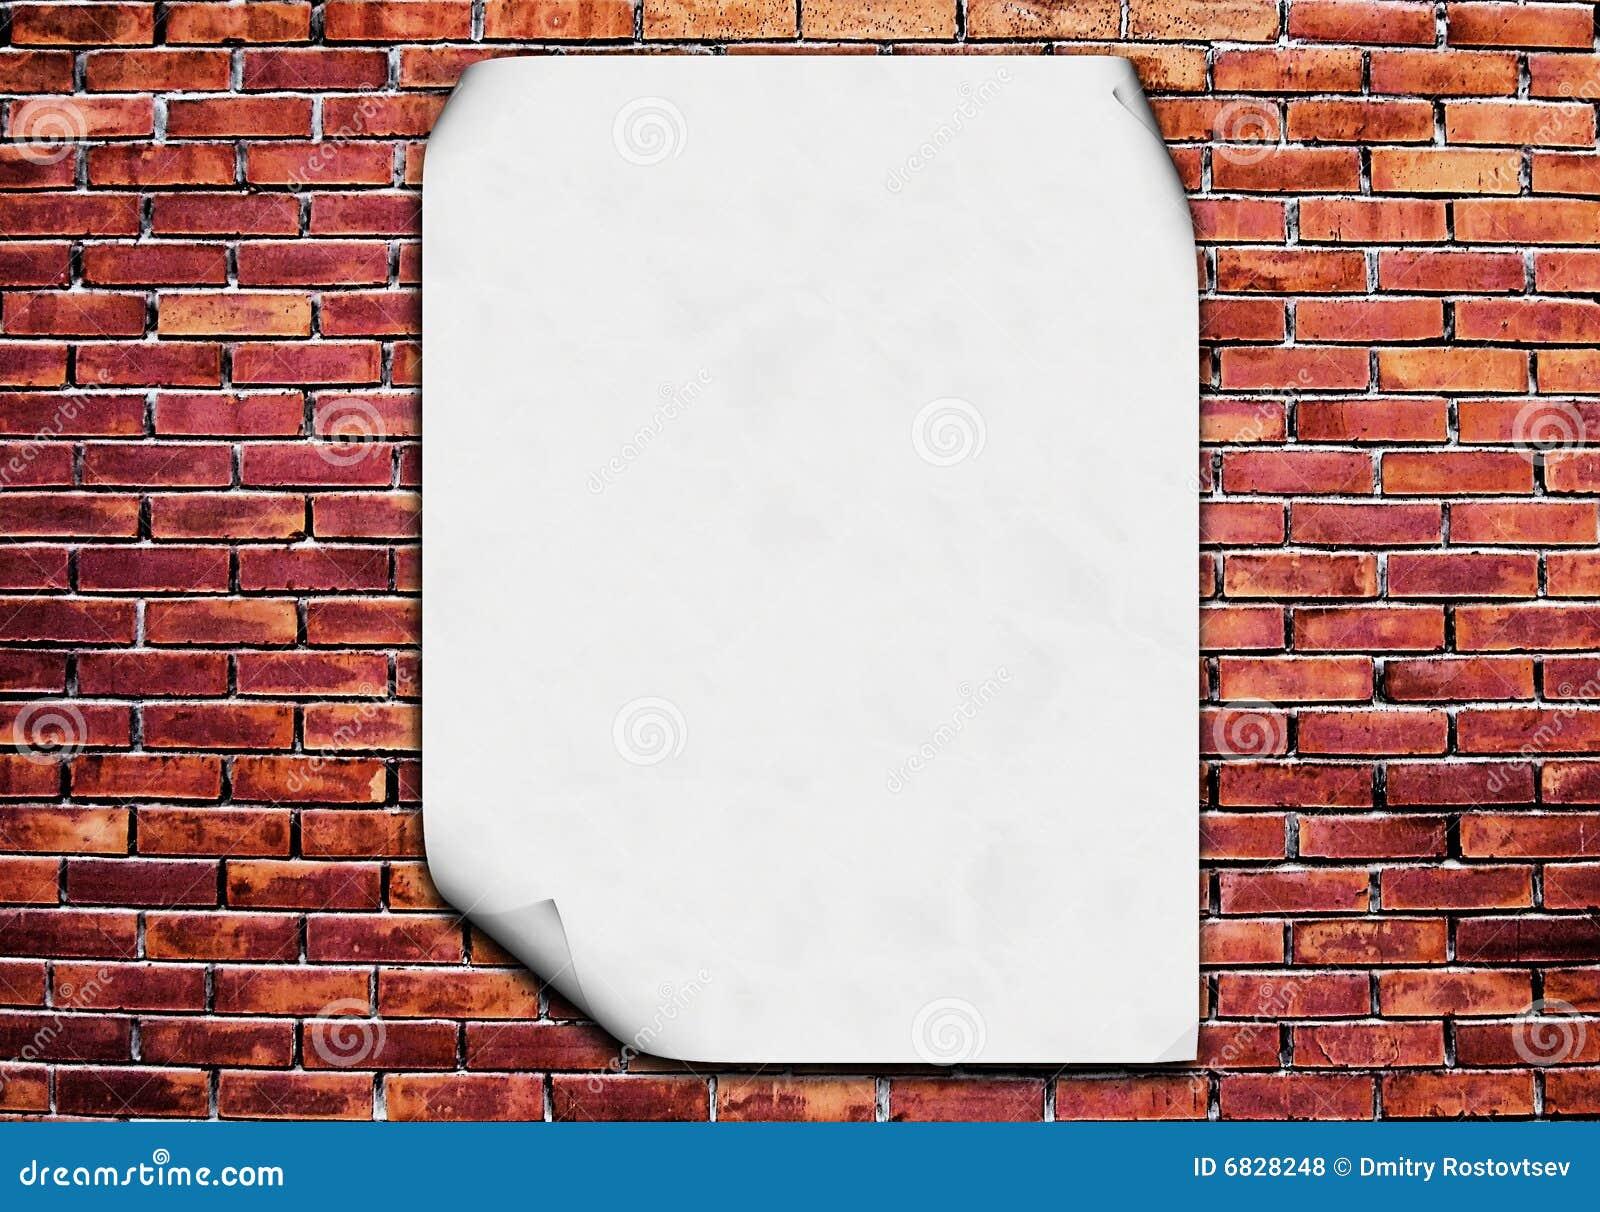 Blank white poster